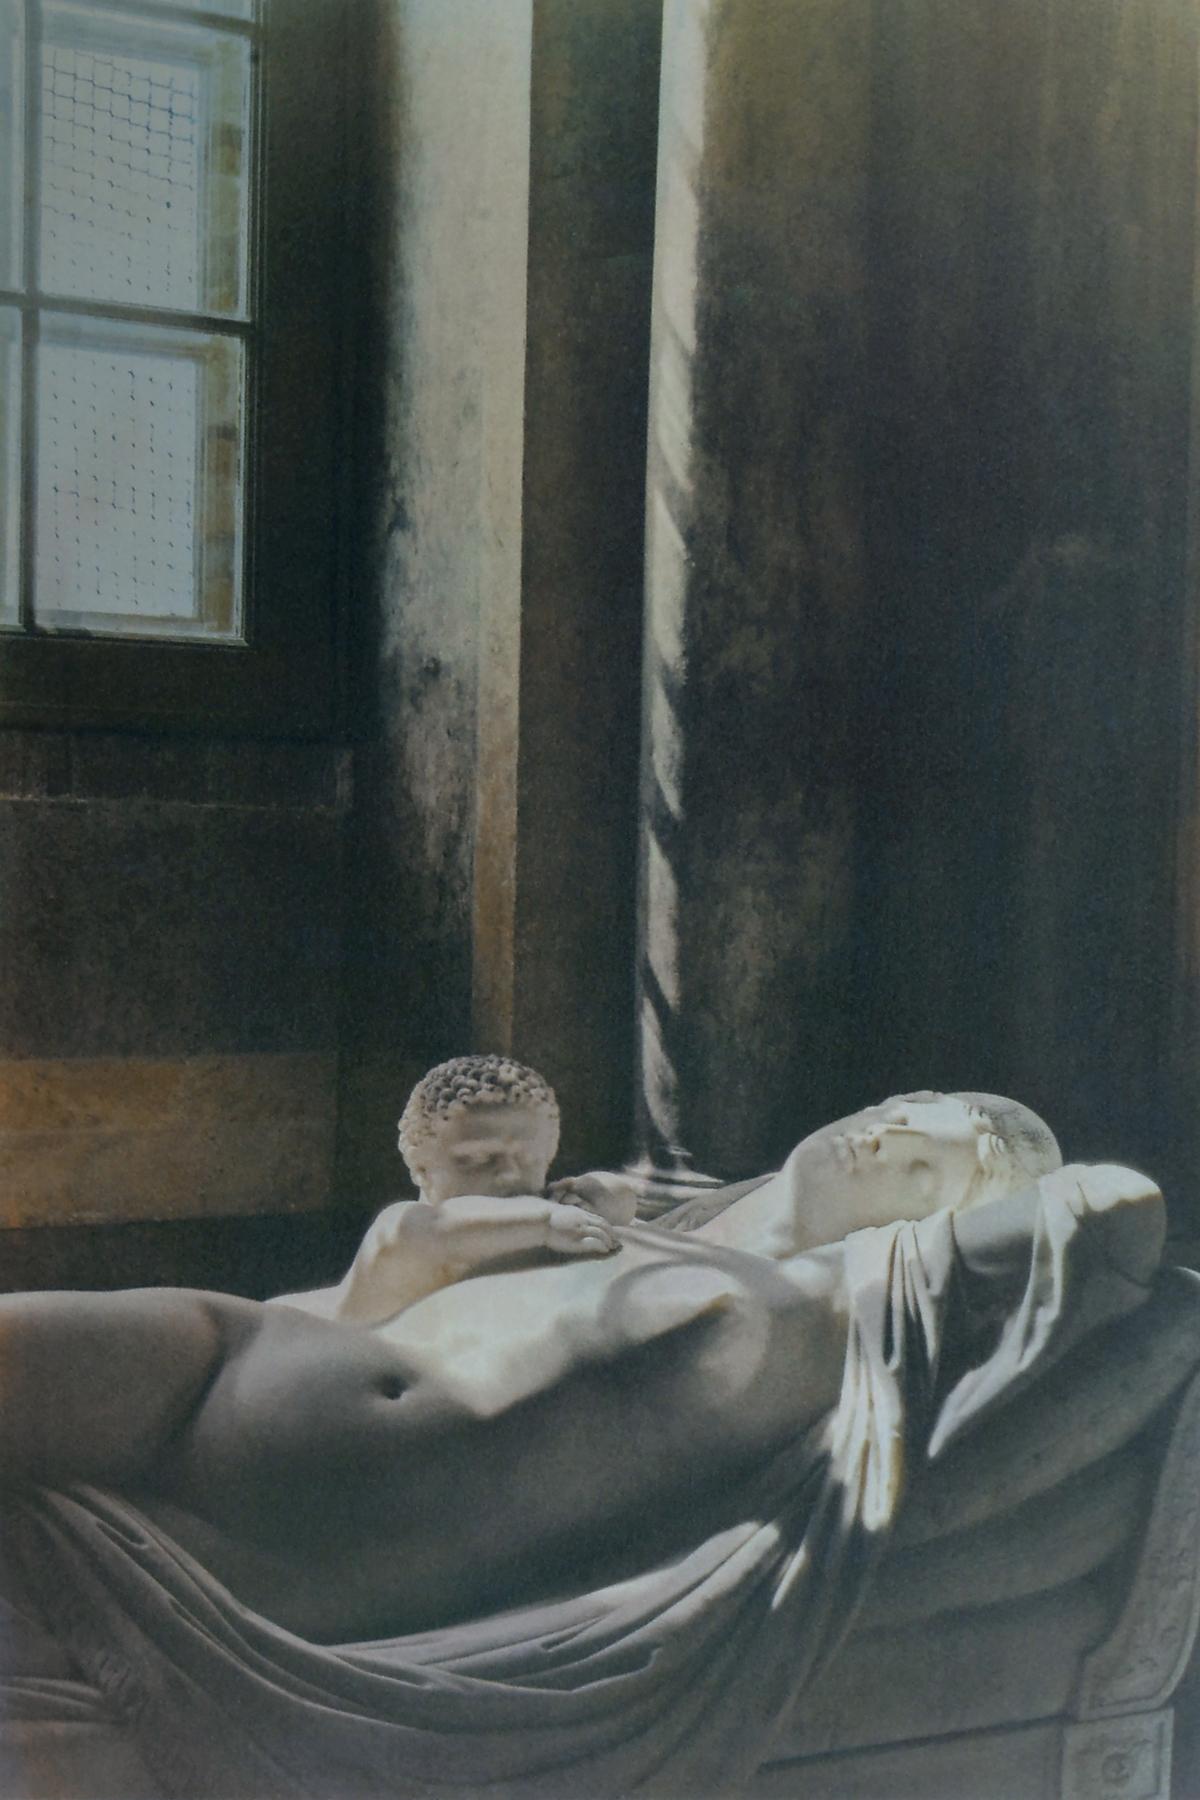 Maria_Vinogradova_Alone in a Palace_Museum Attendant's Midsummer Dream_2.jpg